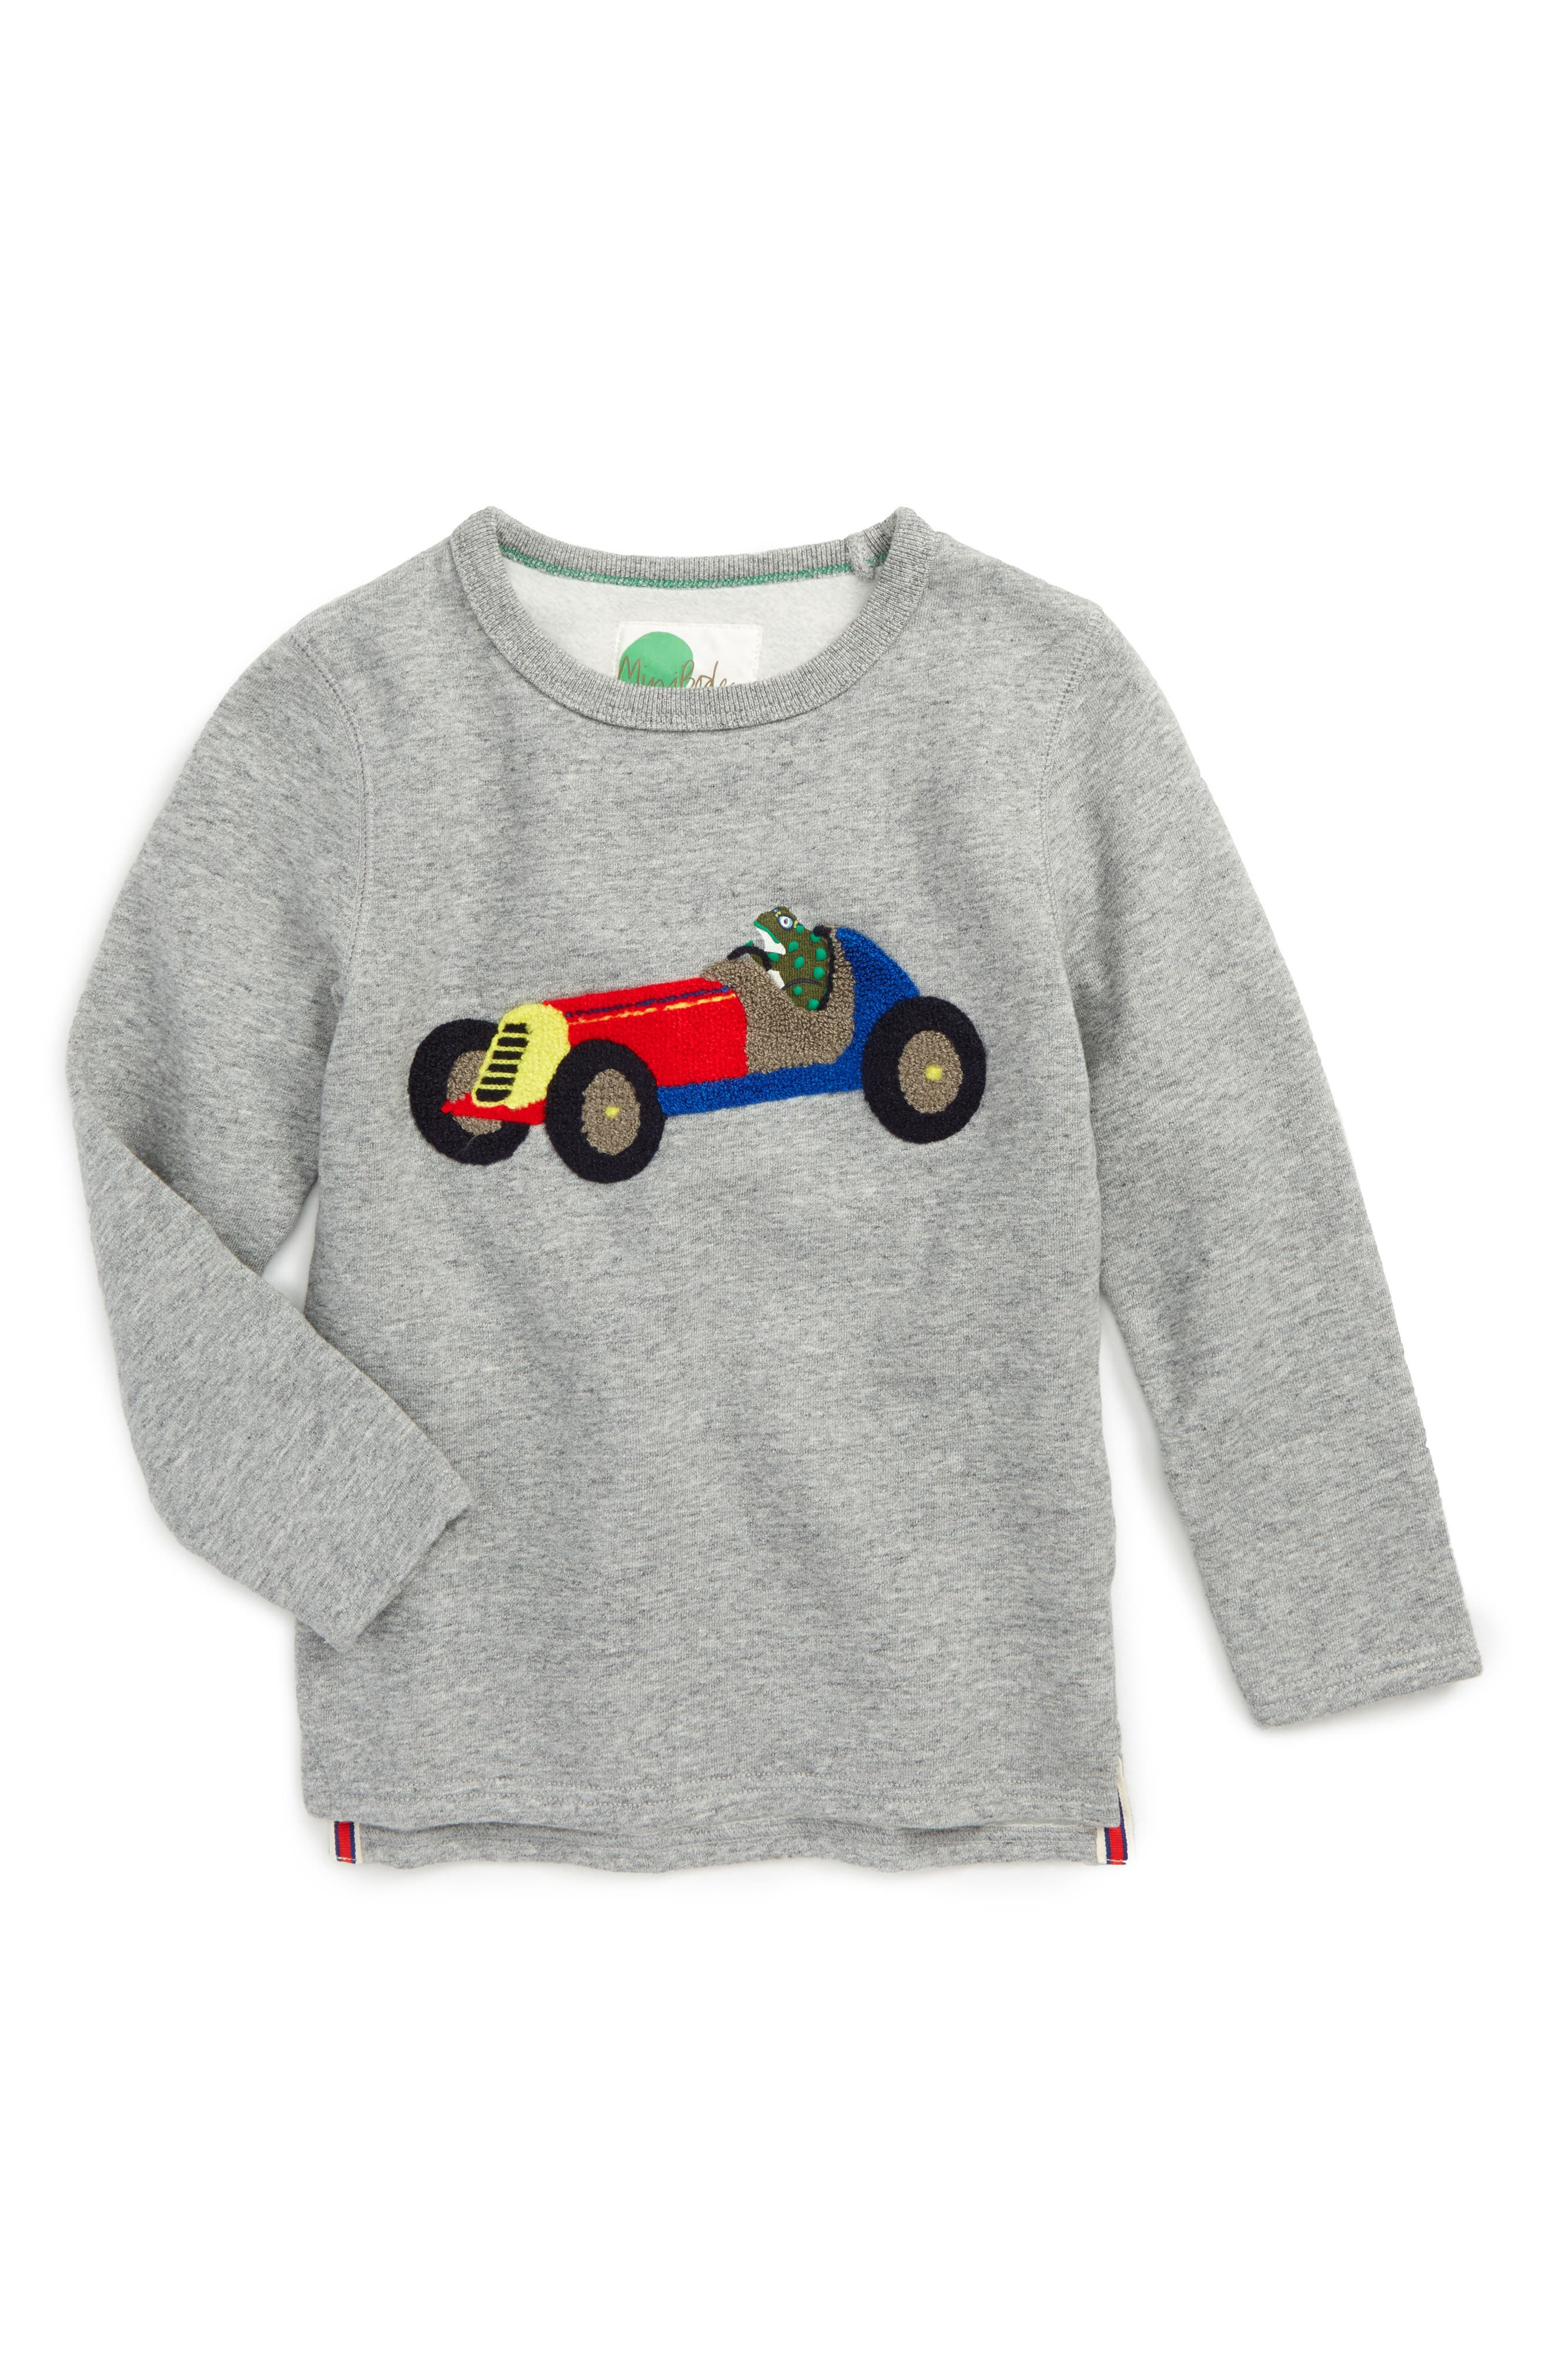 Open Road Sweatshirt,                         Main,                         color, Grey Marl Racing Car